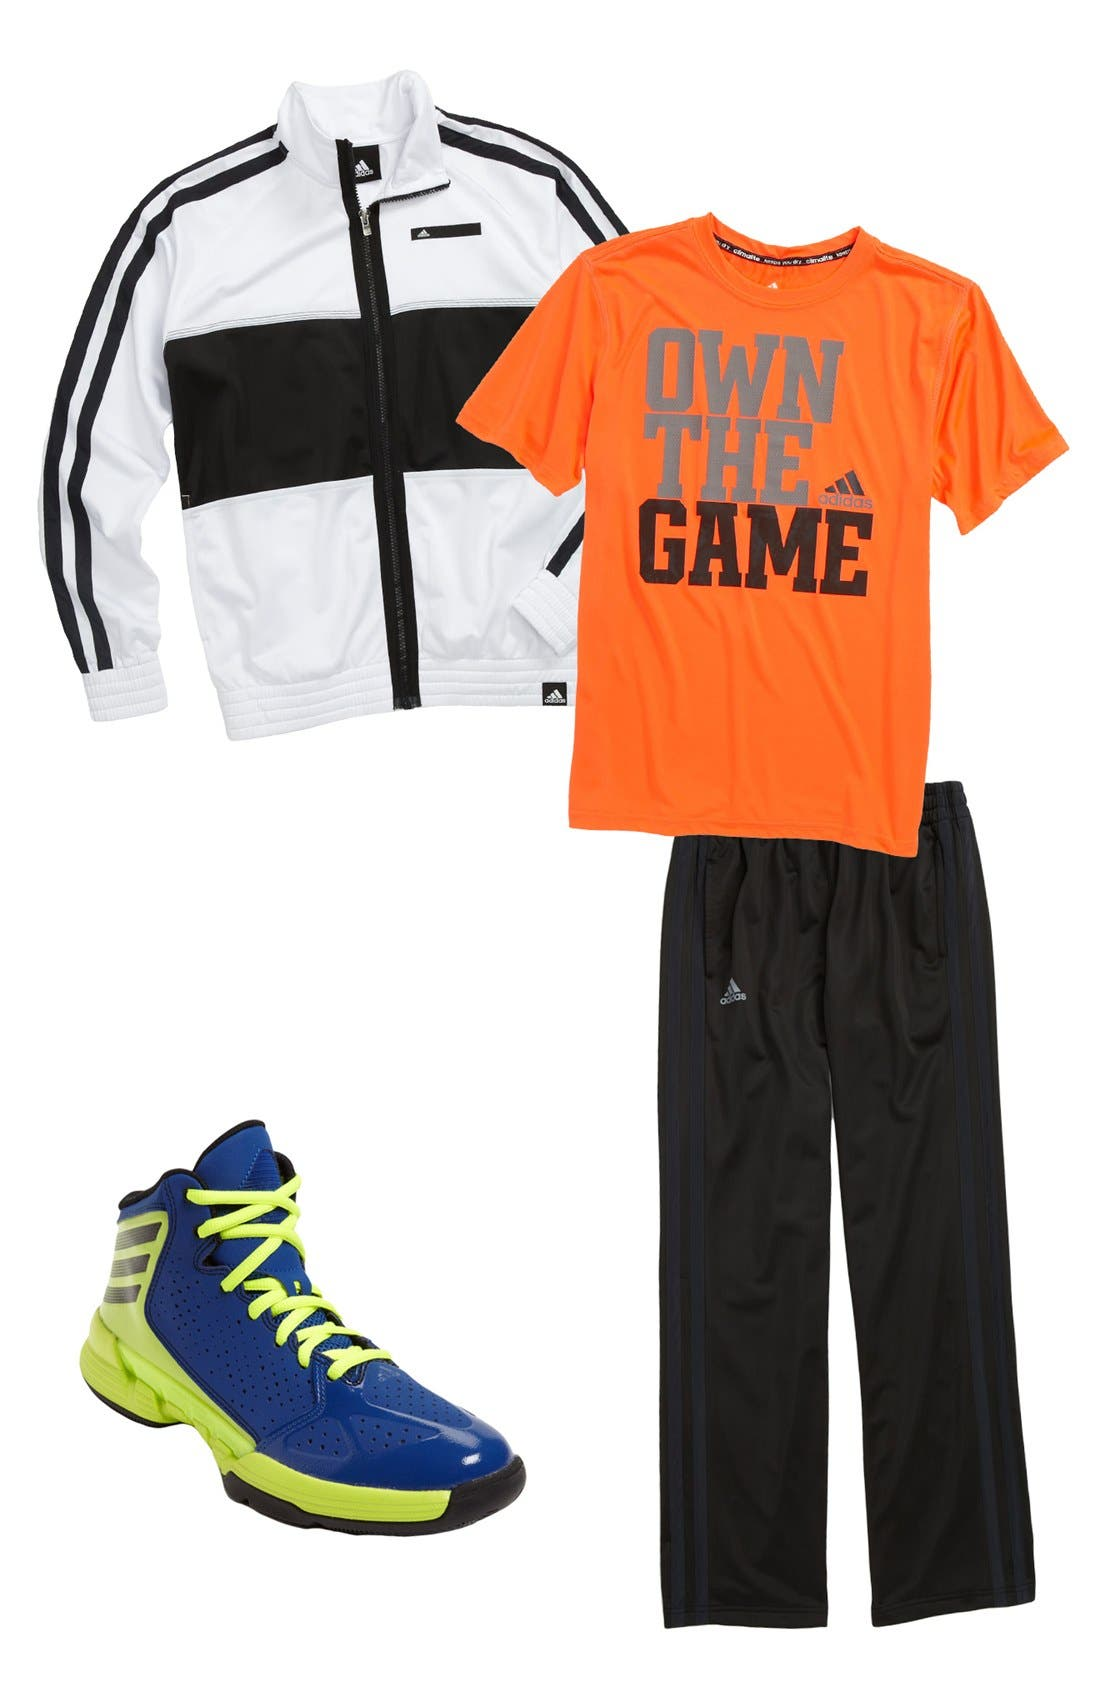 Alternate Image 1 Selected - adidas T-Shirt, Jacket, Pants & Basketball Shoe (Big Boys)